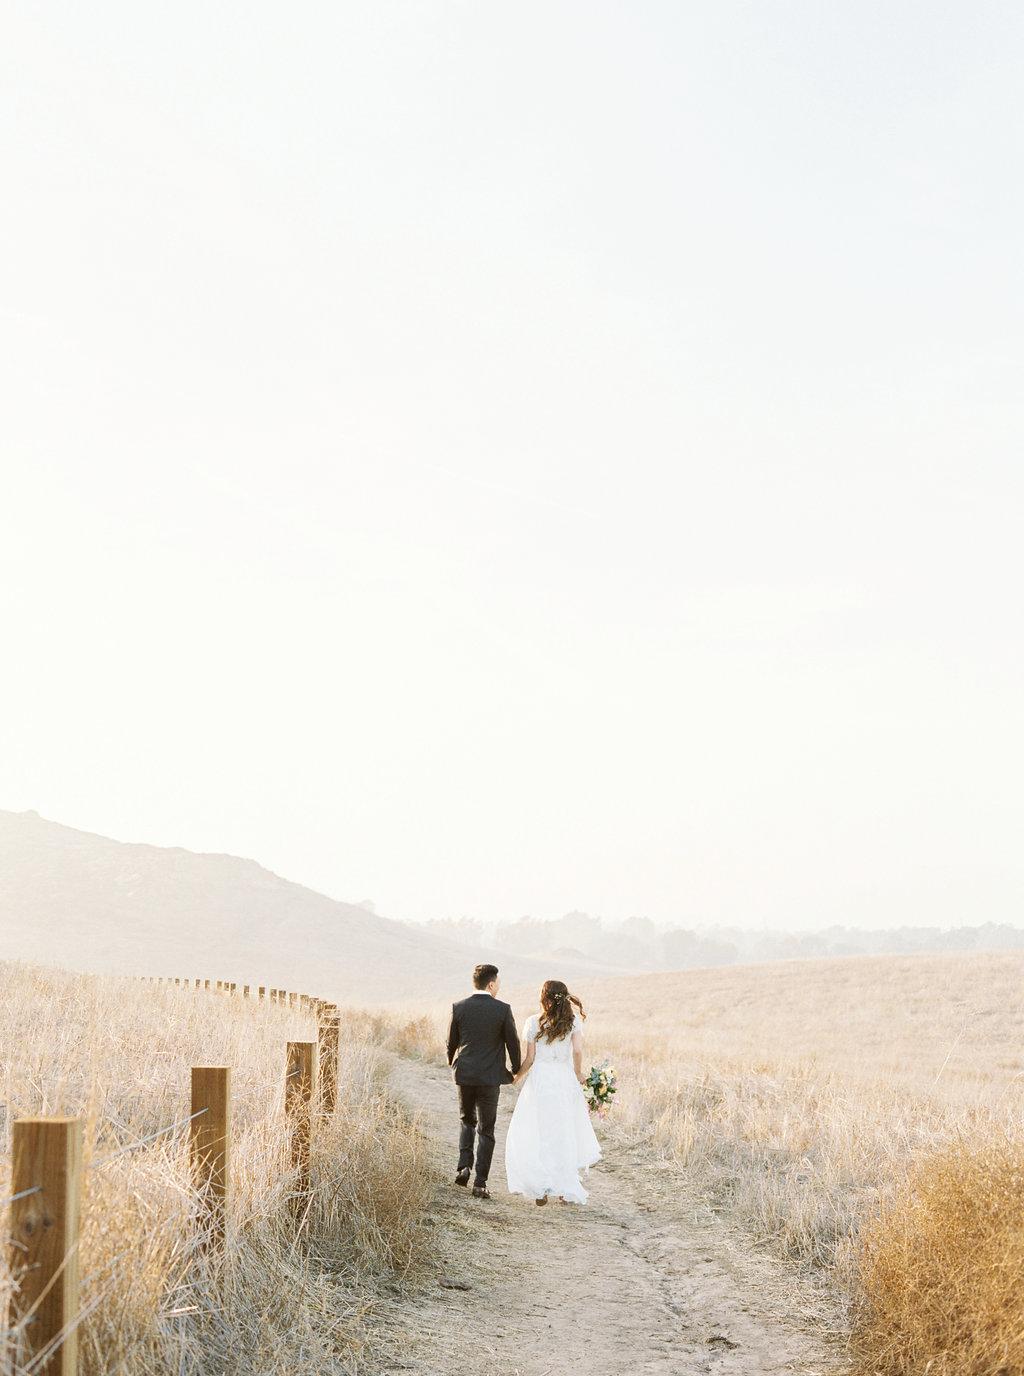 Dreamy golden hour field engagement photo | Bouquet by Compass Floral | Wedding Florist in San Diego and Southern California | Meiwen Wang Photography    #gardenromantic       #sandiegowedding    #sandiegoweddingflorist       #orangecountyflorist     #floraldesign       #dreamwedding    #fineartwedding    #fineartflowers    #fineartcuration    #weddingdetails    #weddinginspiratio   n #engaged #engagementphotos #engagementphotooutfitinspiration #fieldphotos #dreamyphotos #goldenhour  #engagementphotobouquet